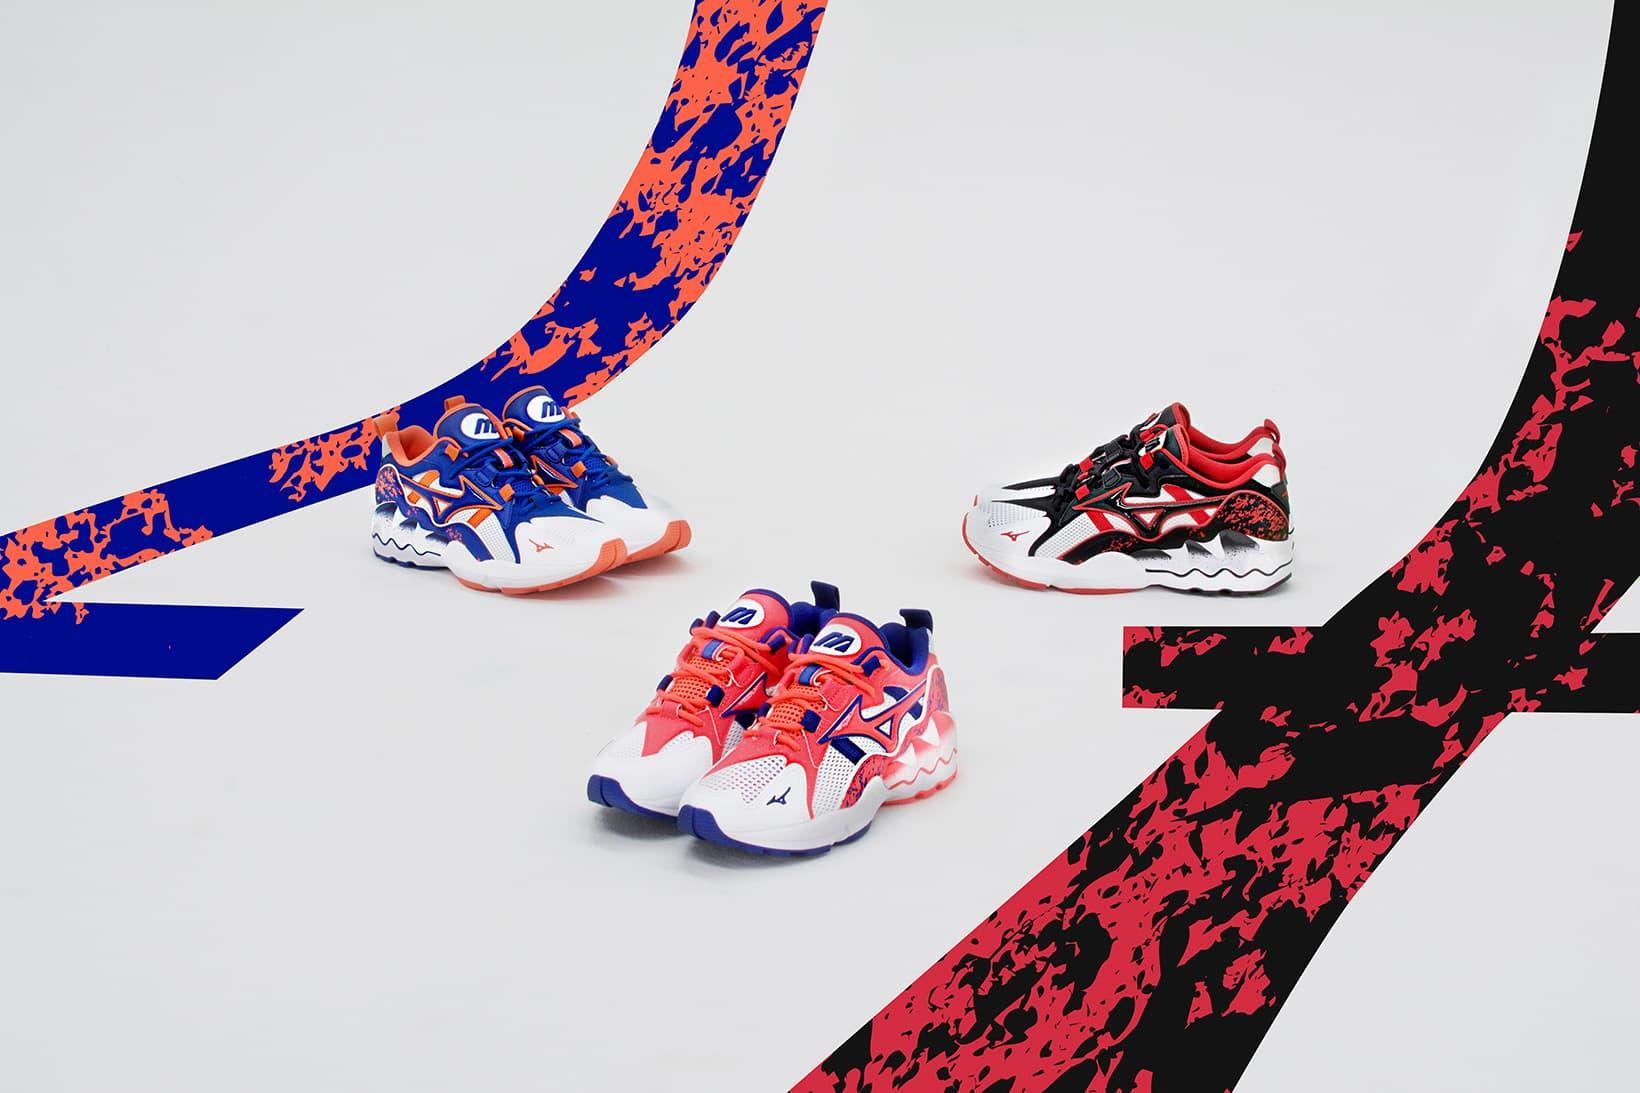 Mizuno Celebrates Iconic 90s Athletic Sneaker with European Streetwear Community